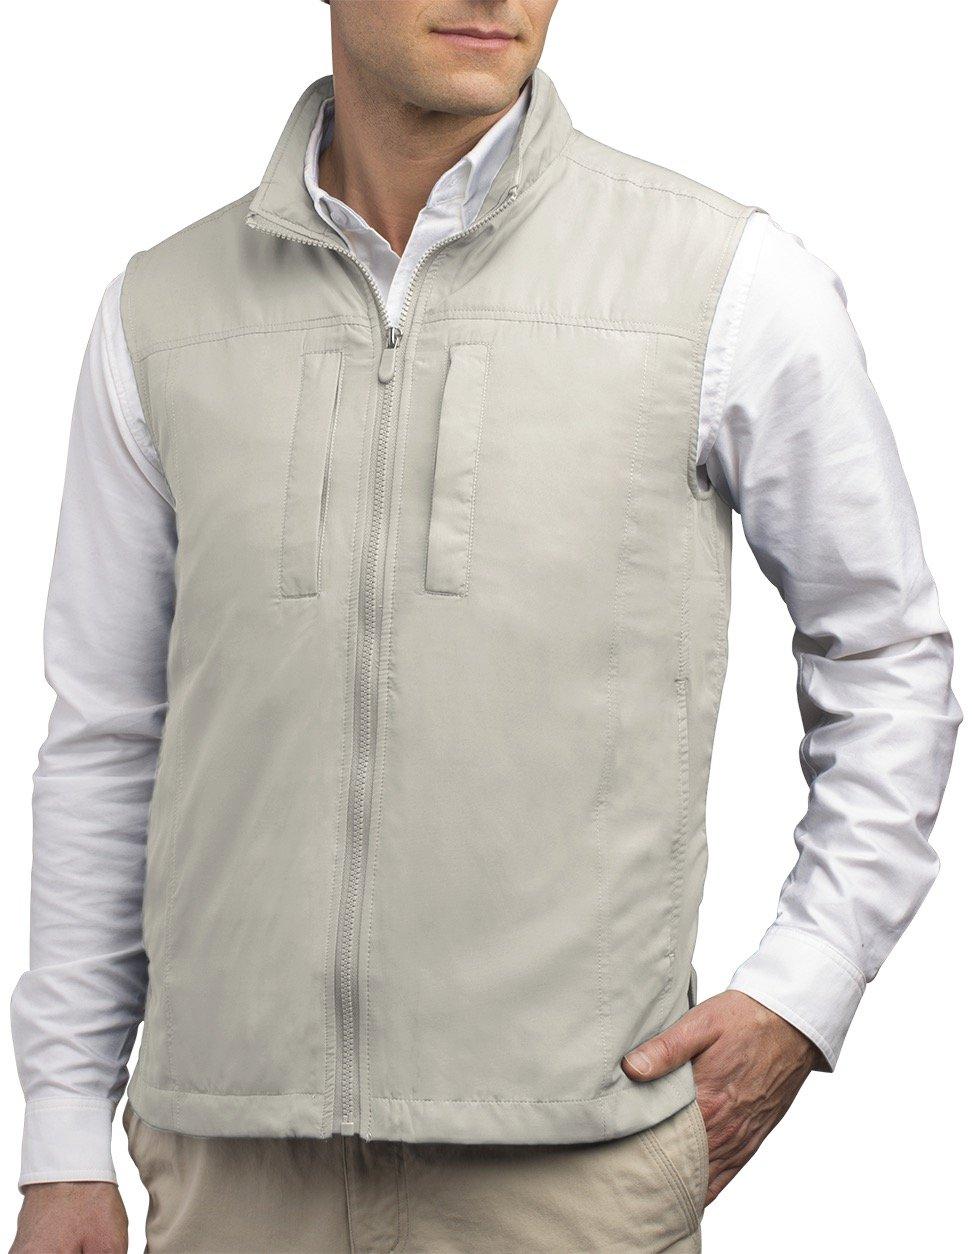 SCOTTeVEST Men's Featherweight Vest - 14 Pockets - Travel Clothing CMT L